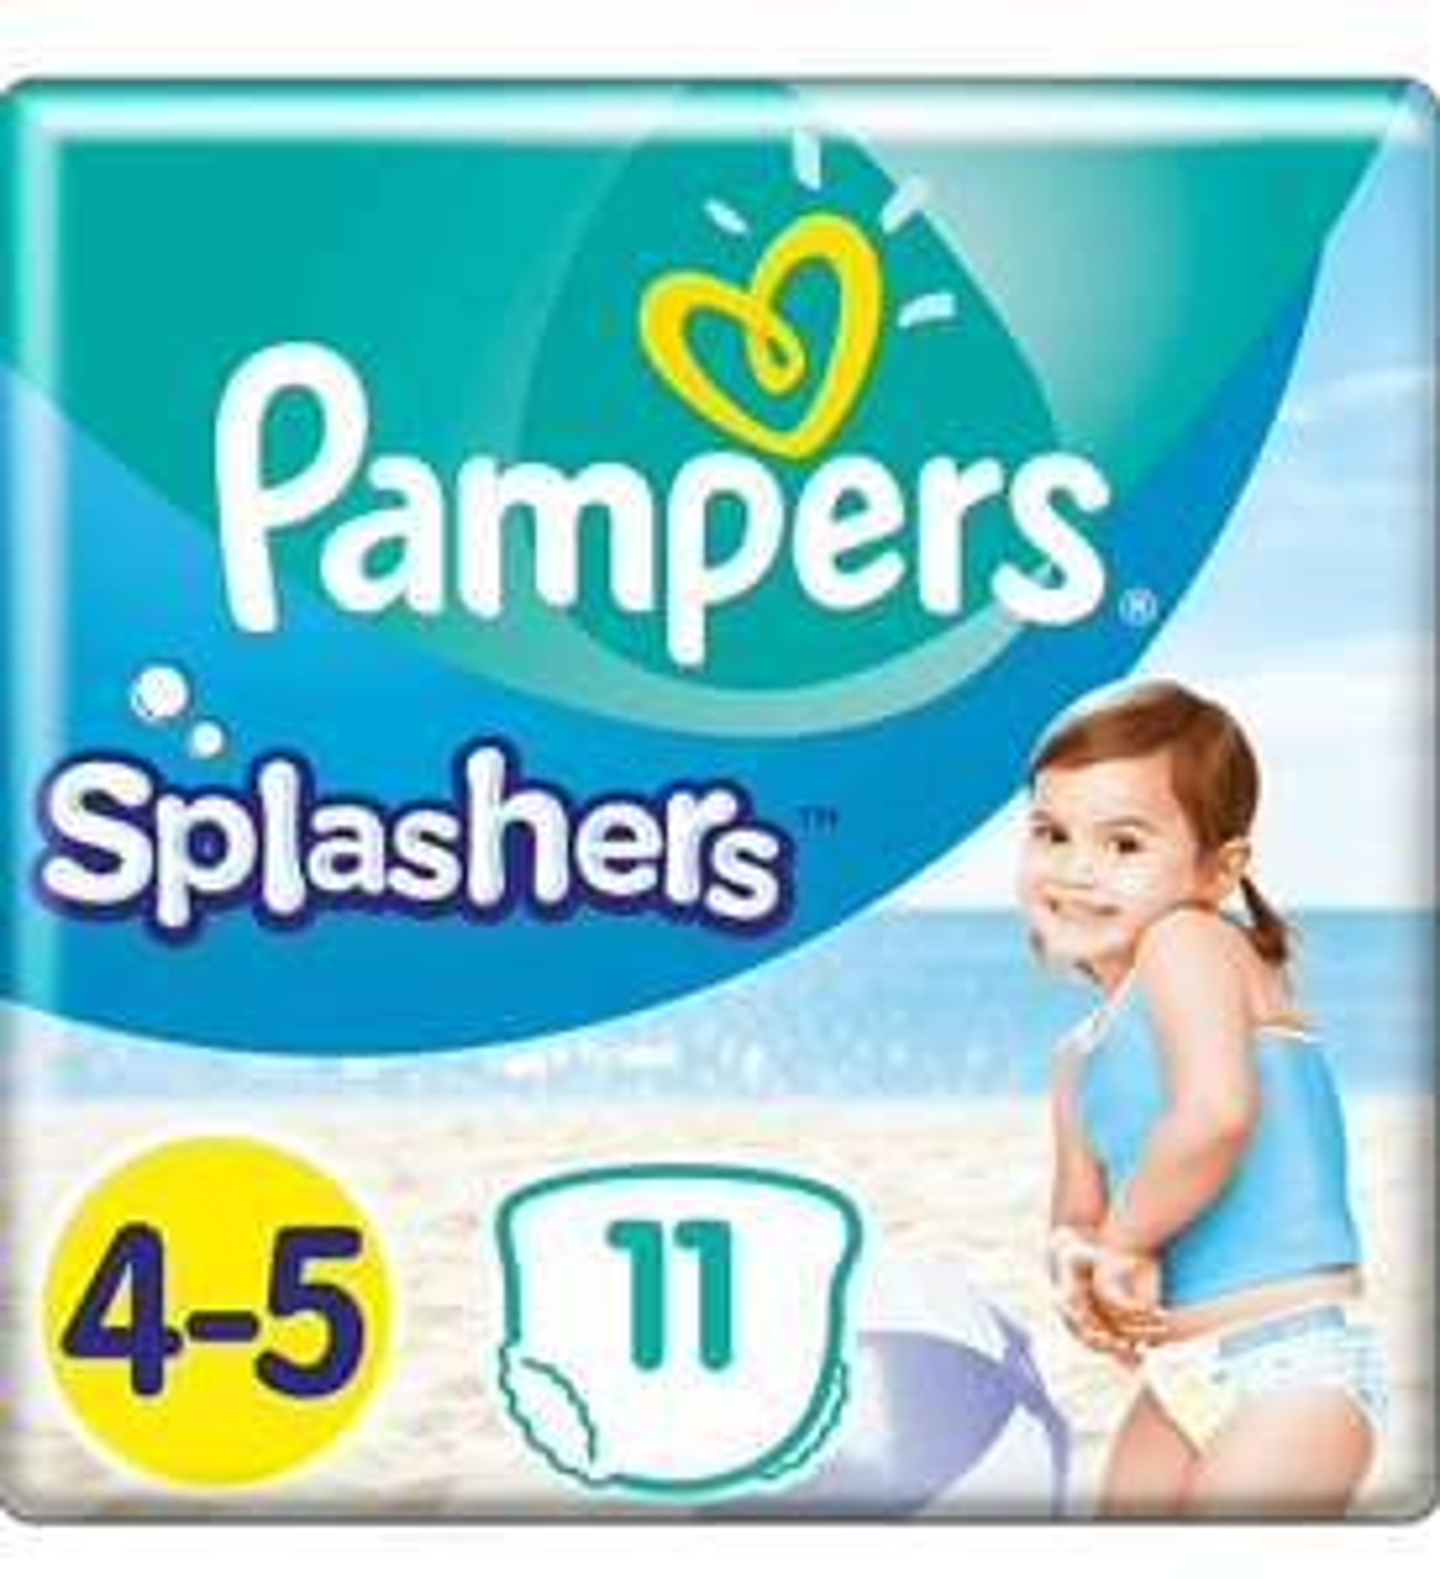 Pampers Splashers Gr. 4-5 (4 x 11 Stuks) @amazon.nl